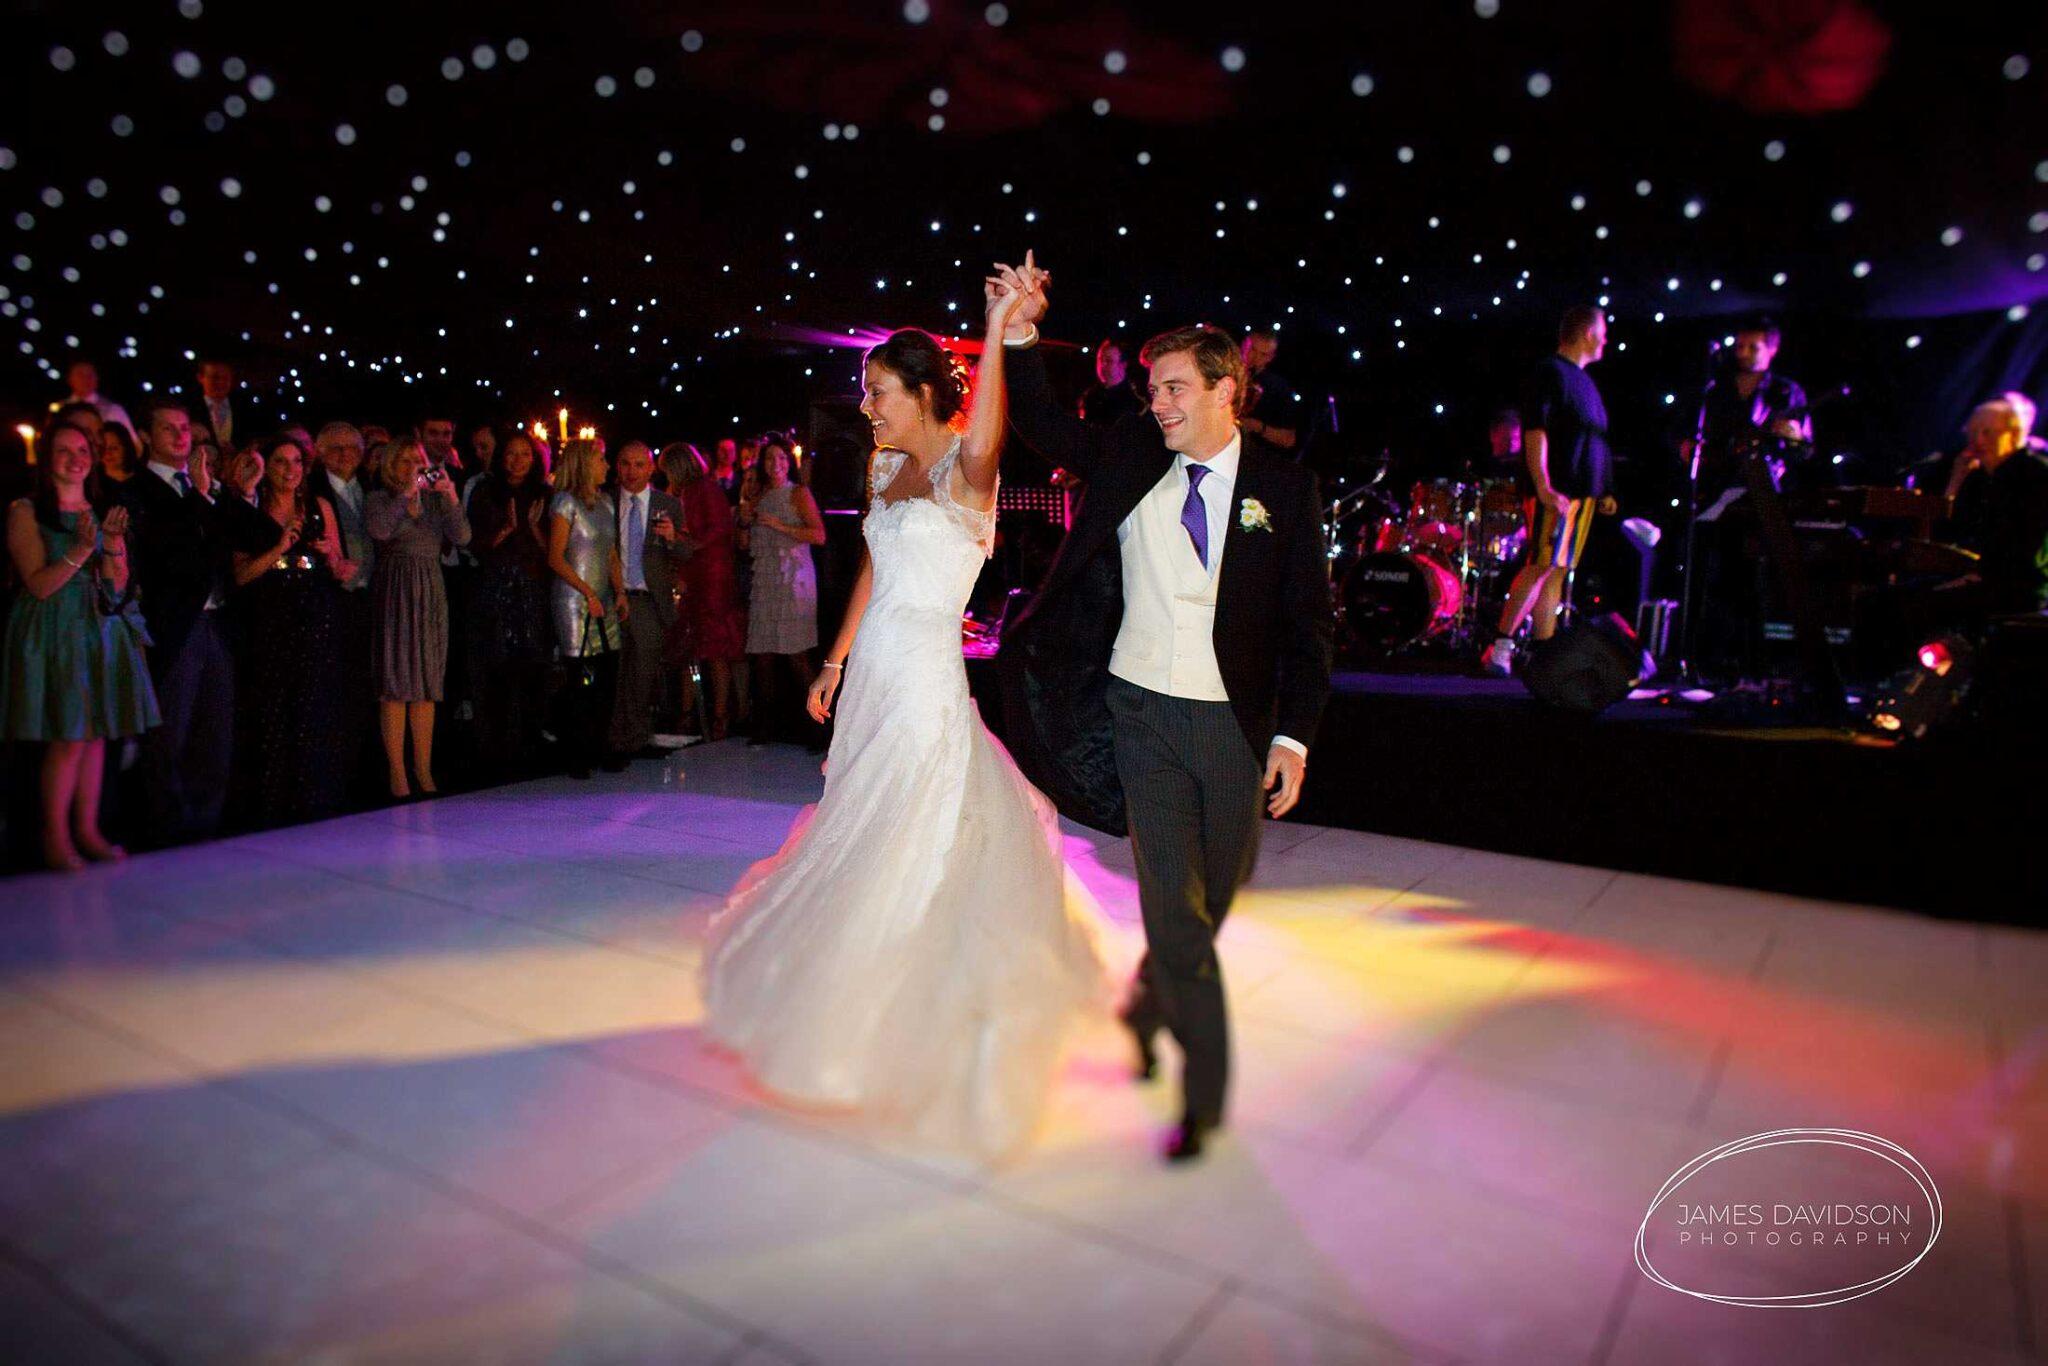 Caroline + Mark | Huddersfield wedding photographer